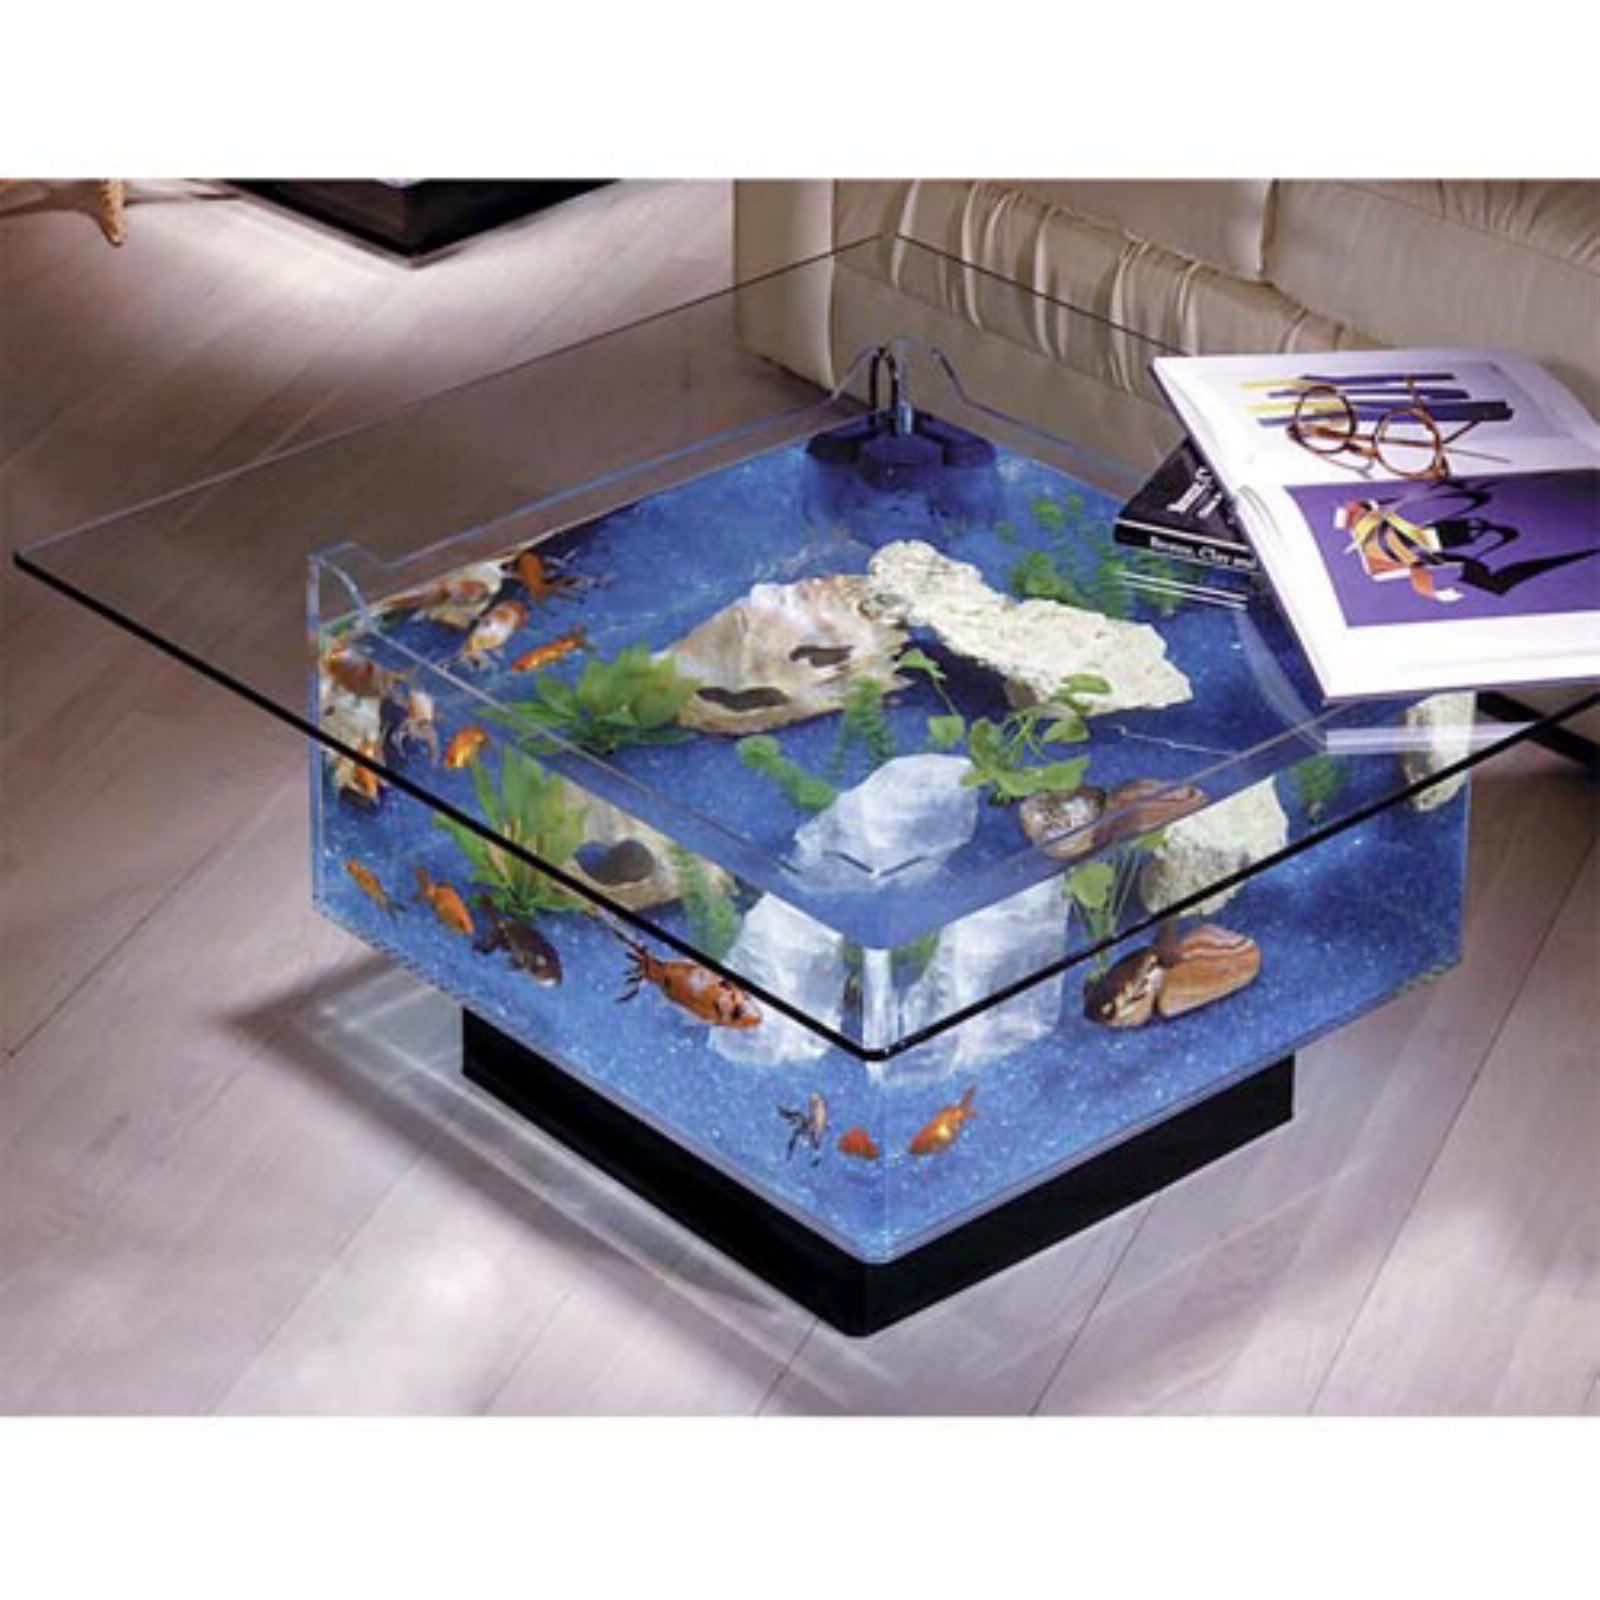 aqua square coffee table 25 gallon aquarium - walmart